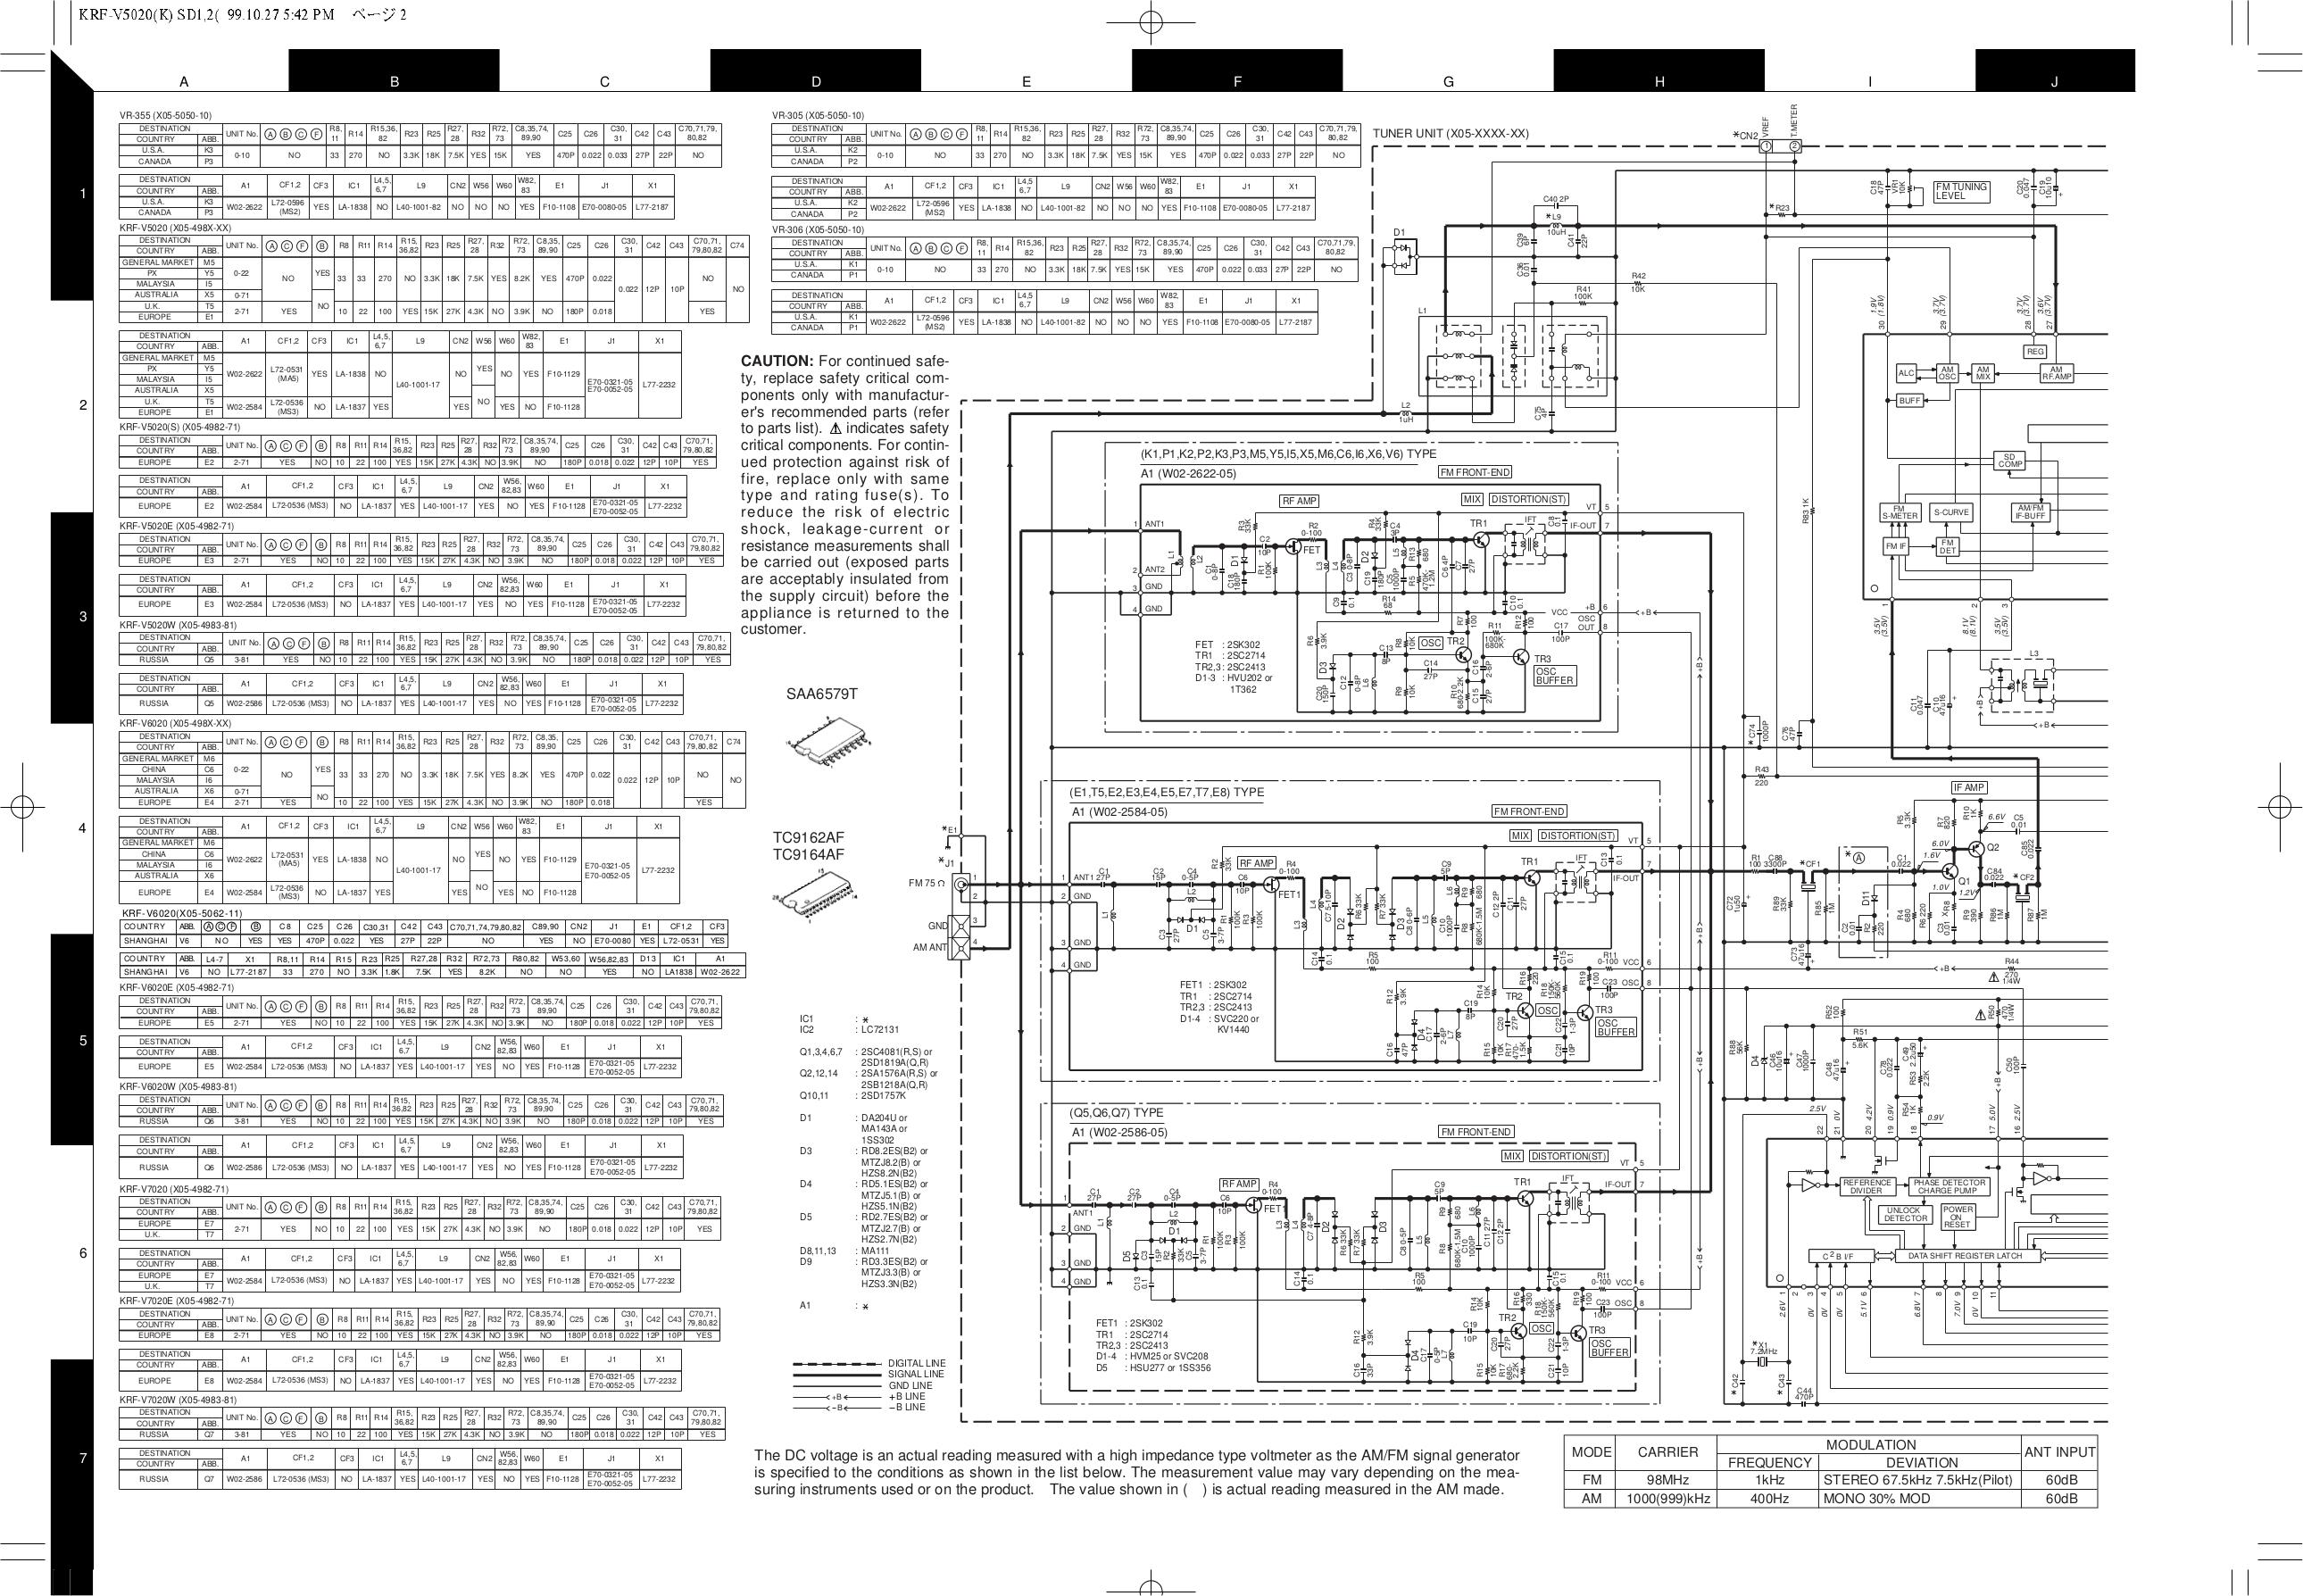 kenwood krf v5020 wiring diagram wiring diagram virtual. Black Bedroom Furniture Sets. Home Design Ideas